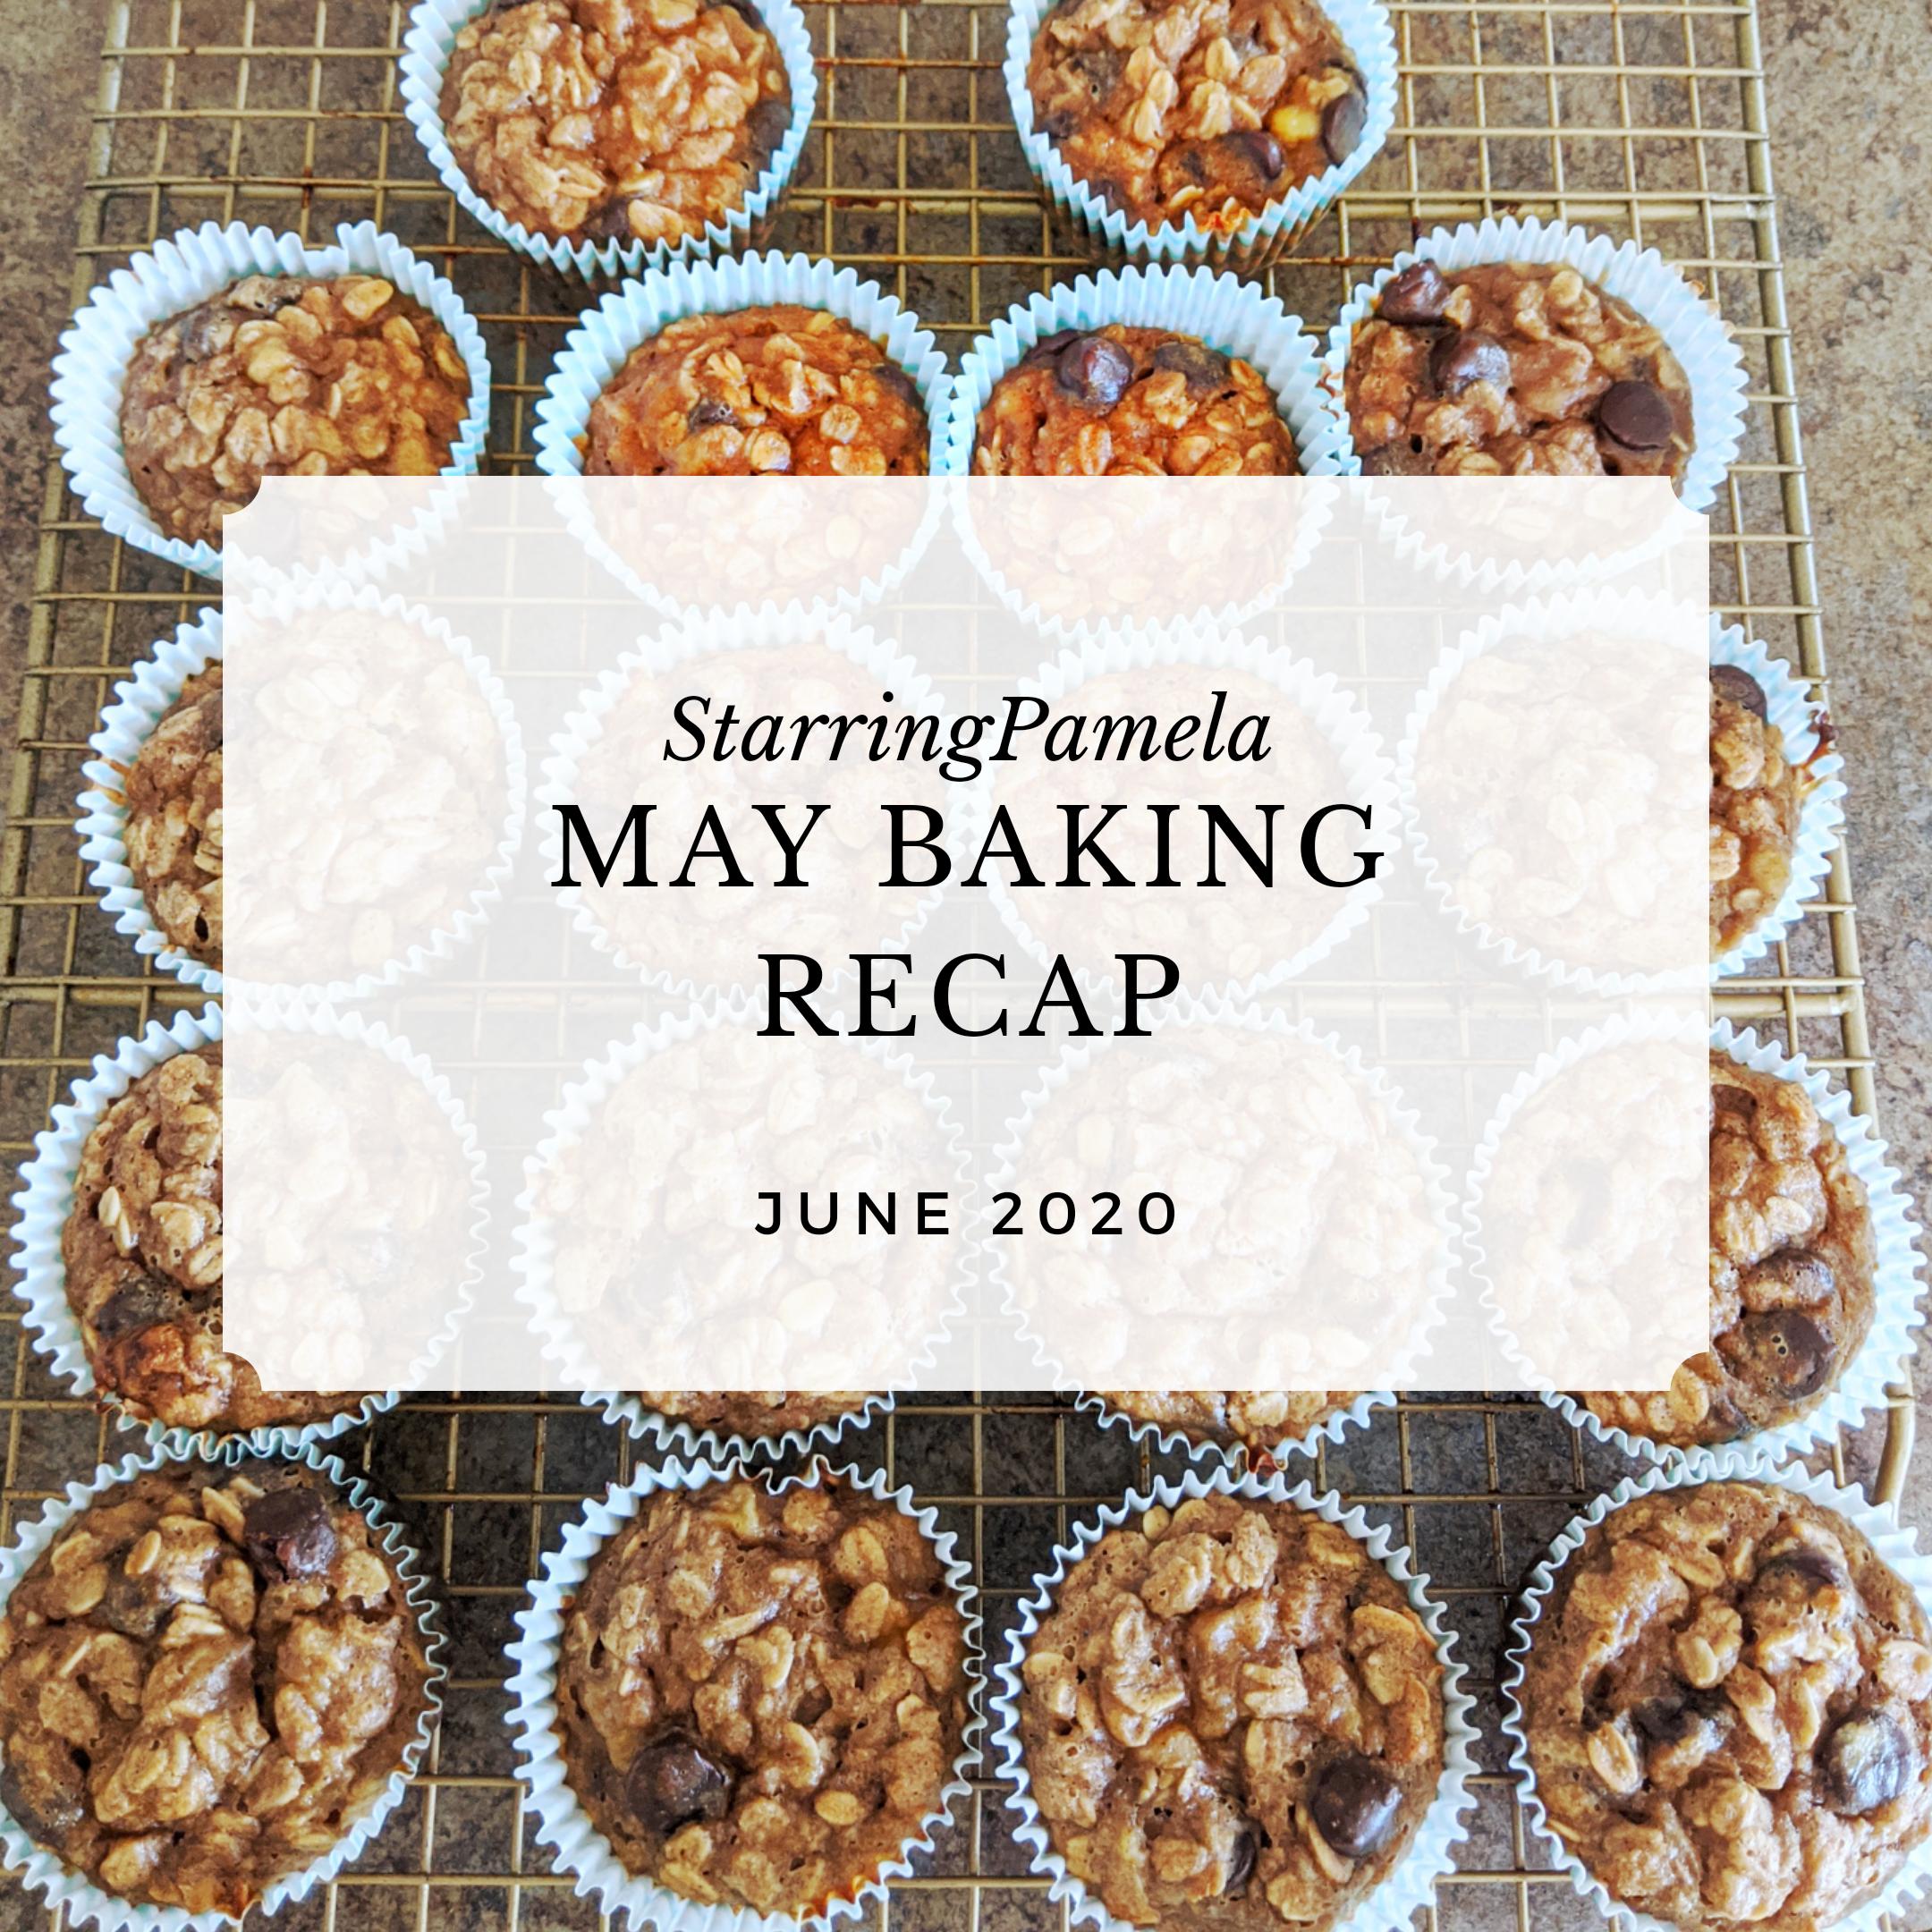 may baking recap featured image